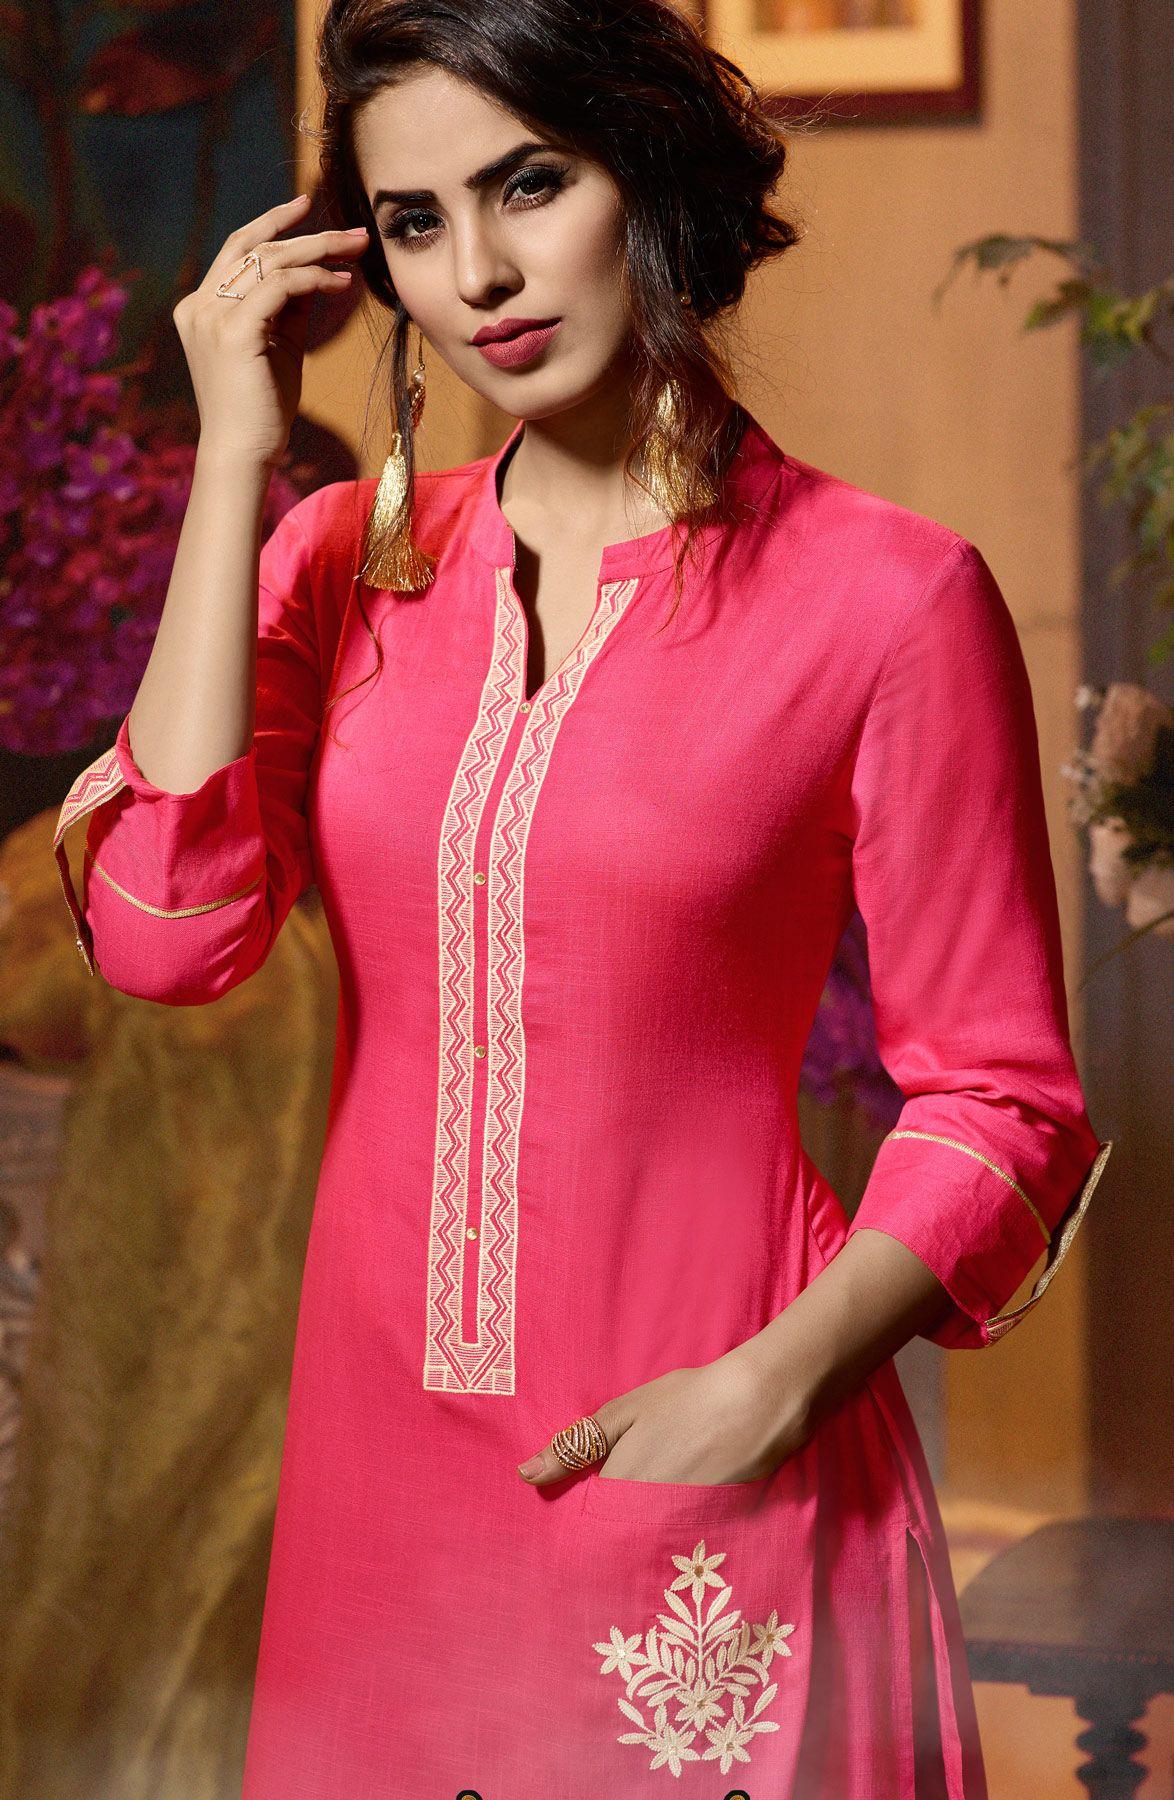 e013f630a92 Majestic Pink Colored Fancy Embroidered Rayon Kurti